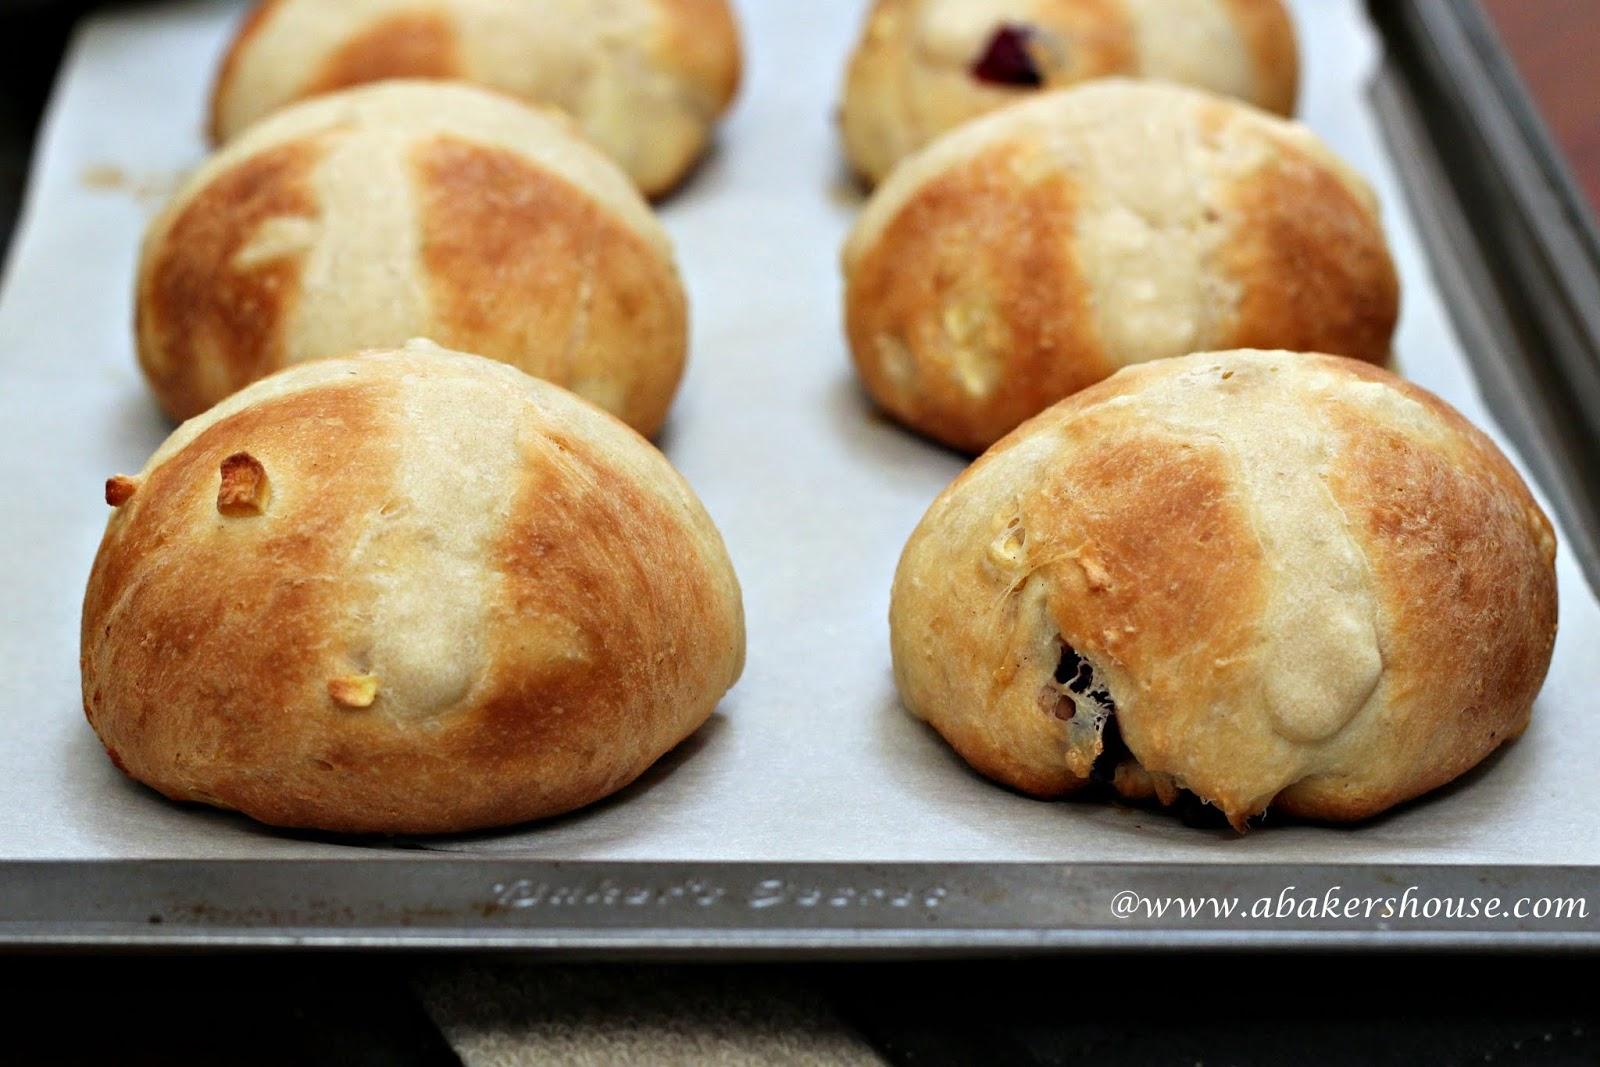 Up close view of homemade hot cross buns